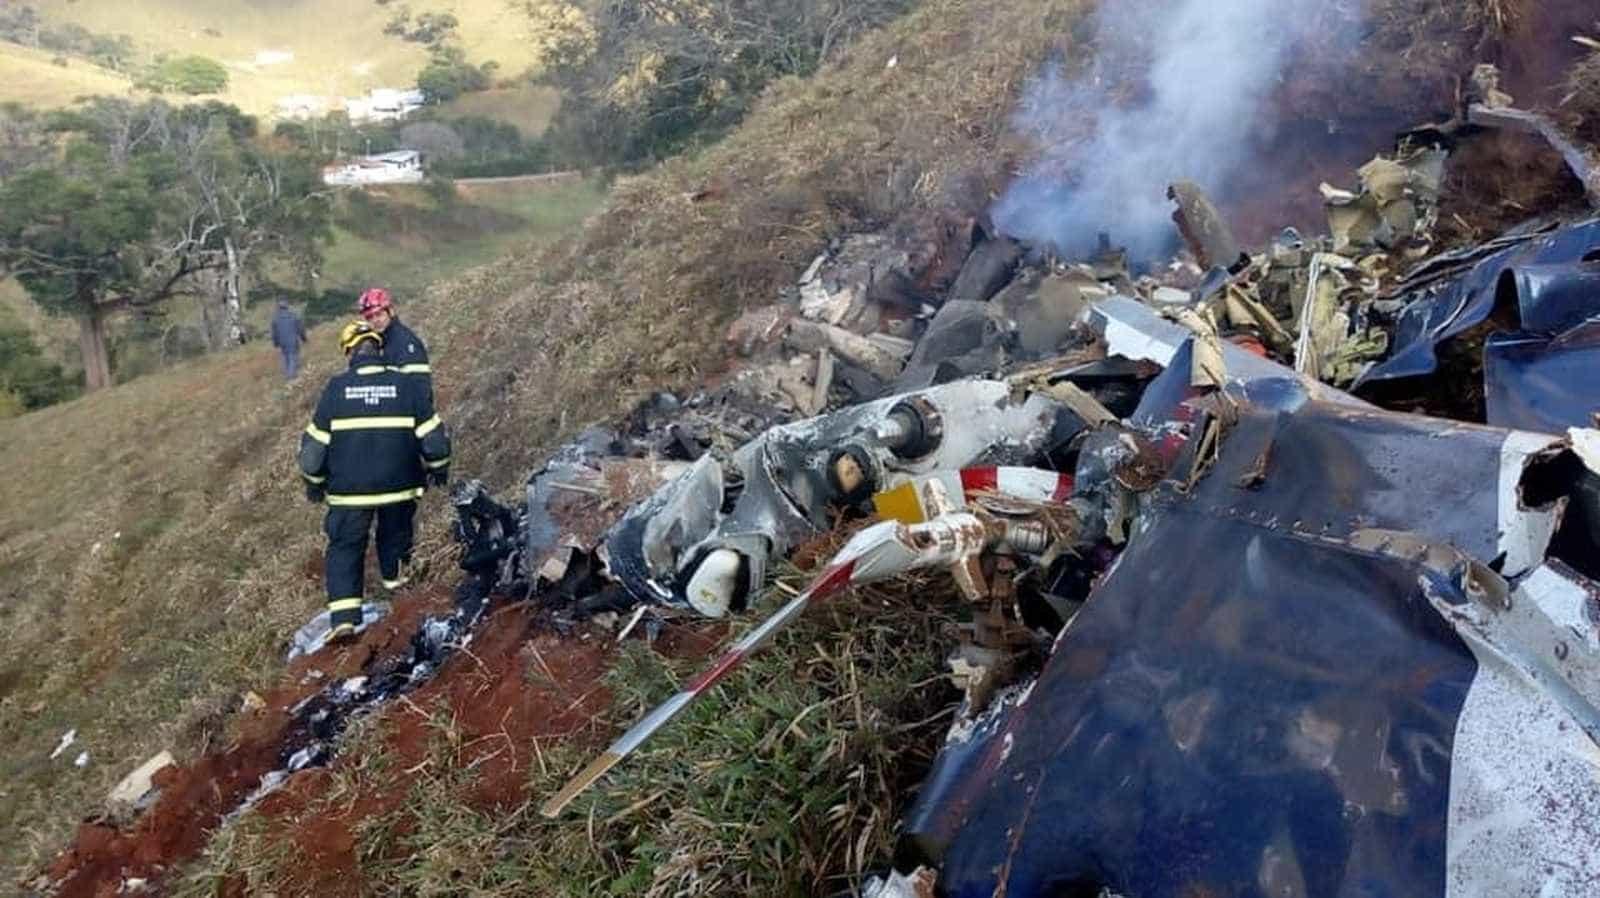 Piloto de helicóptero que caiu relata problemas pouco antes do acidente